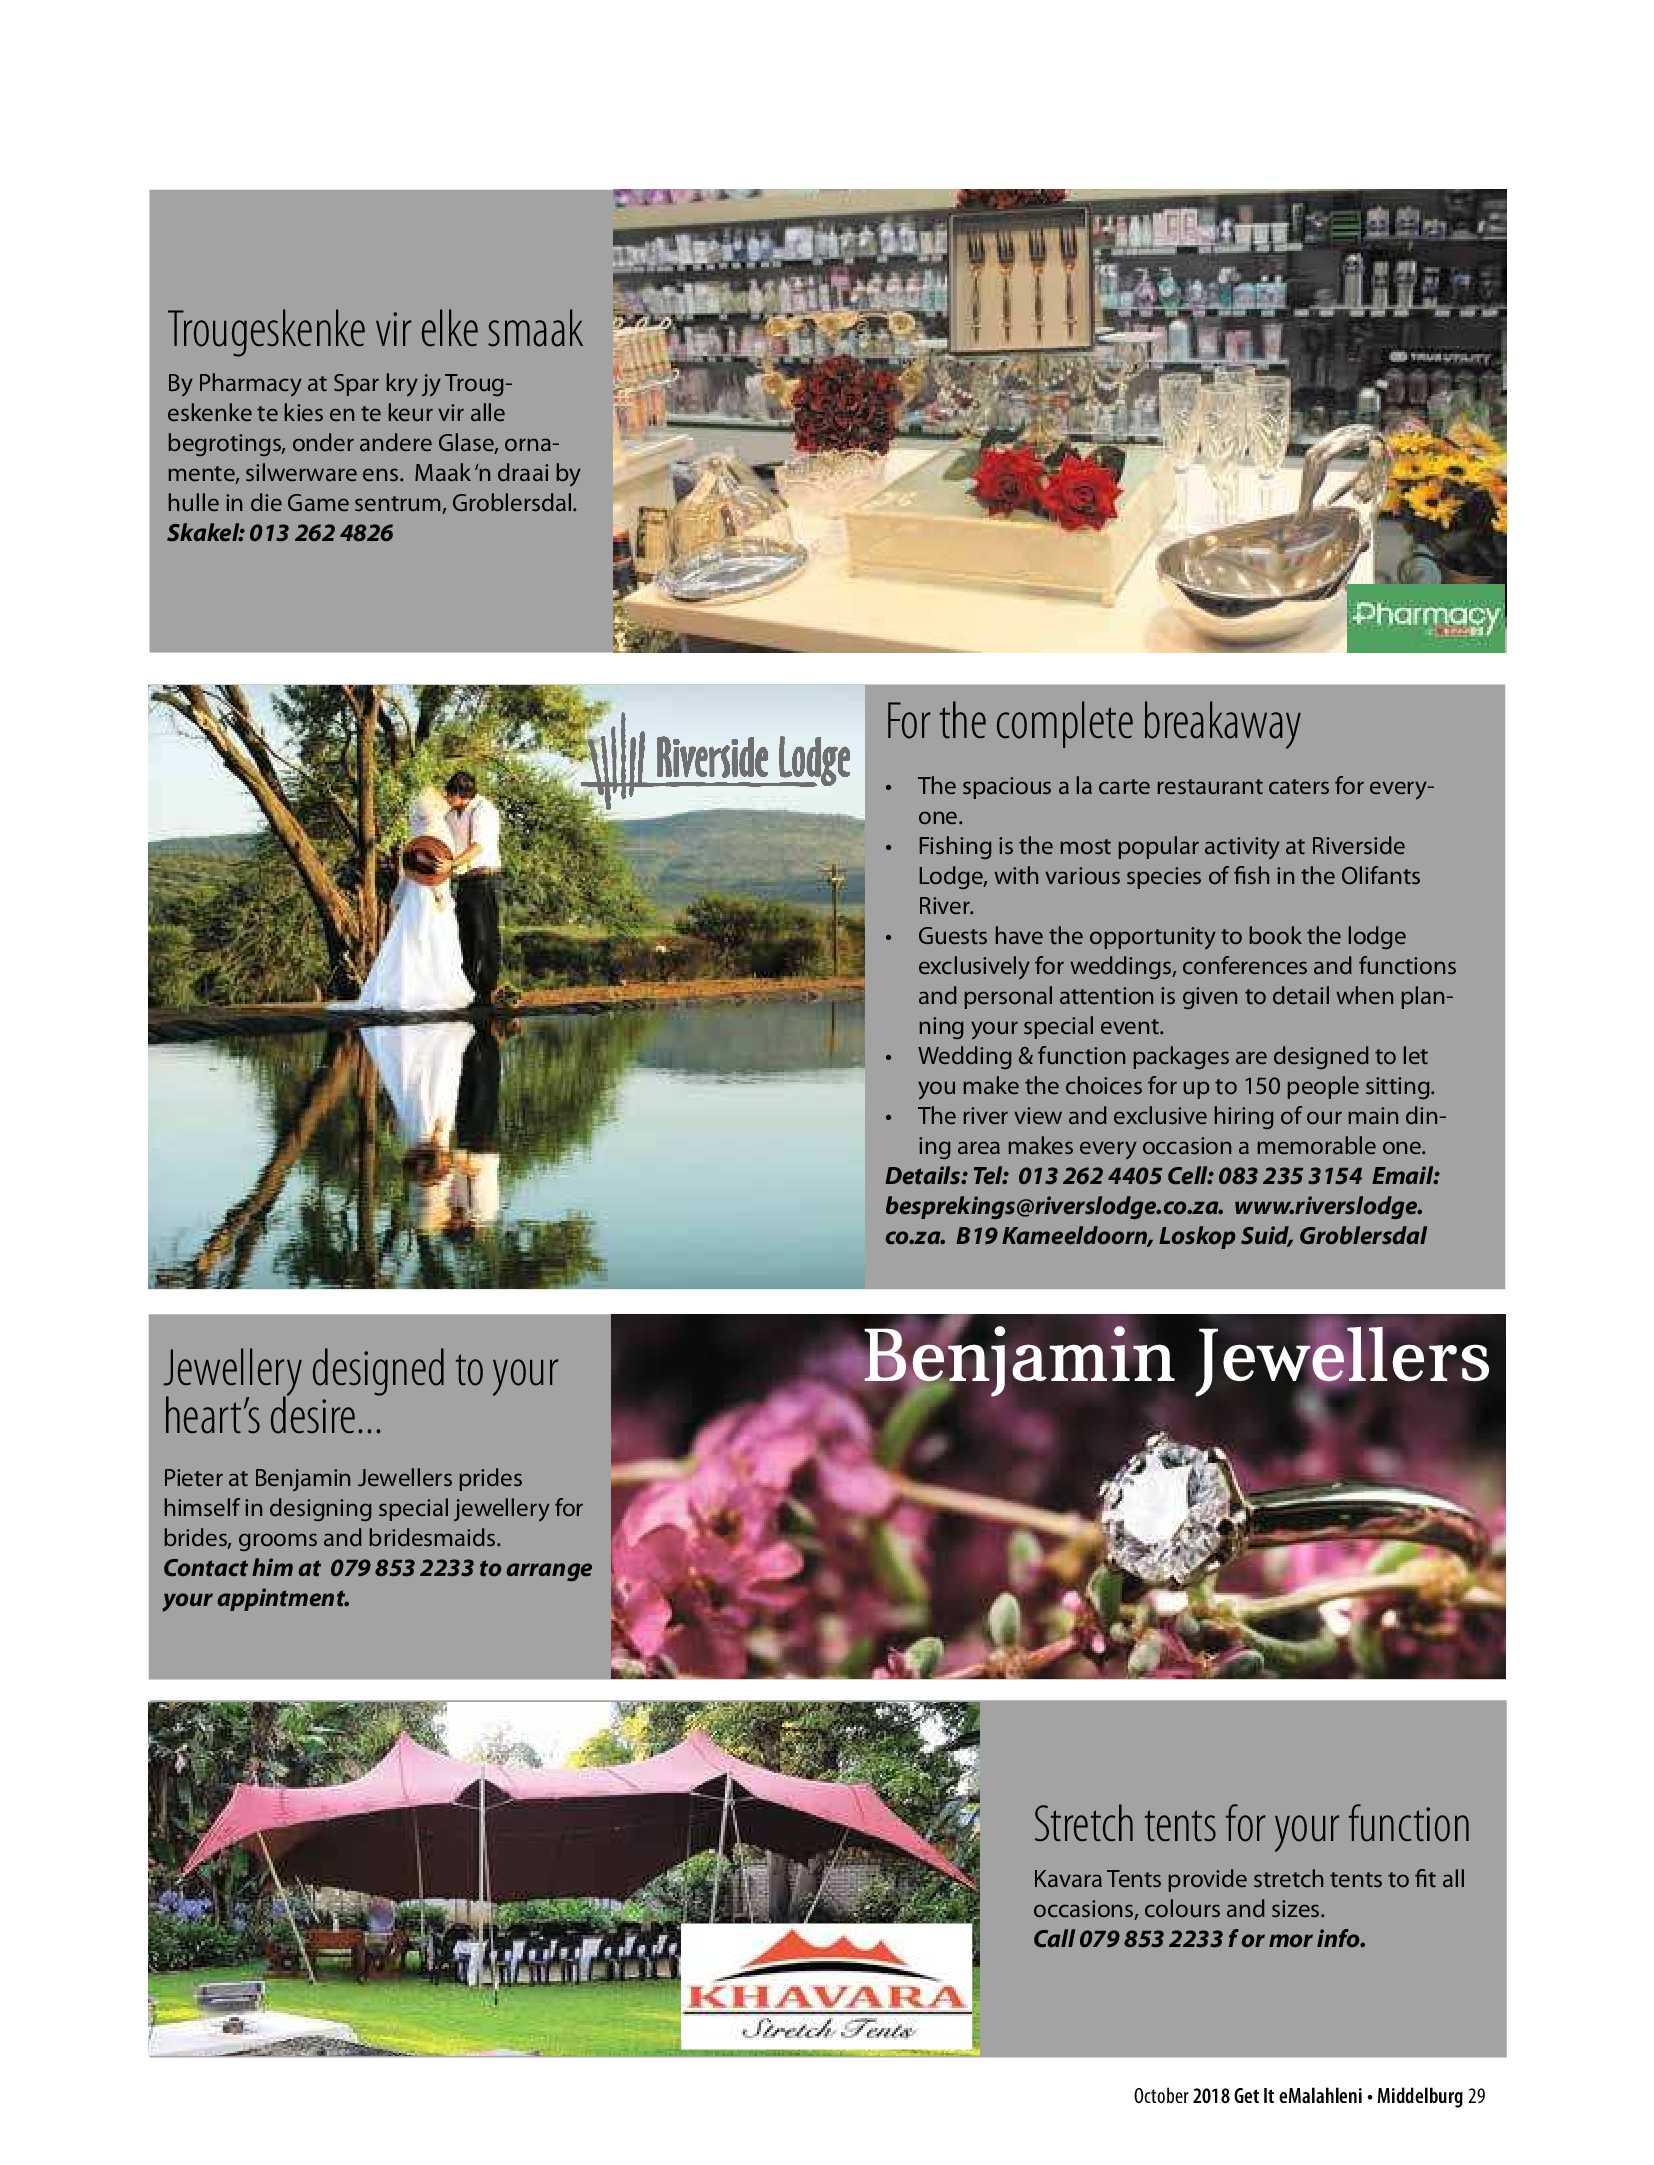 get-middelburg-october-2018-epapers-page-31